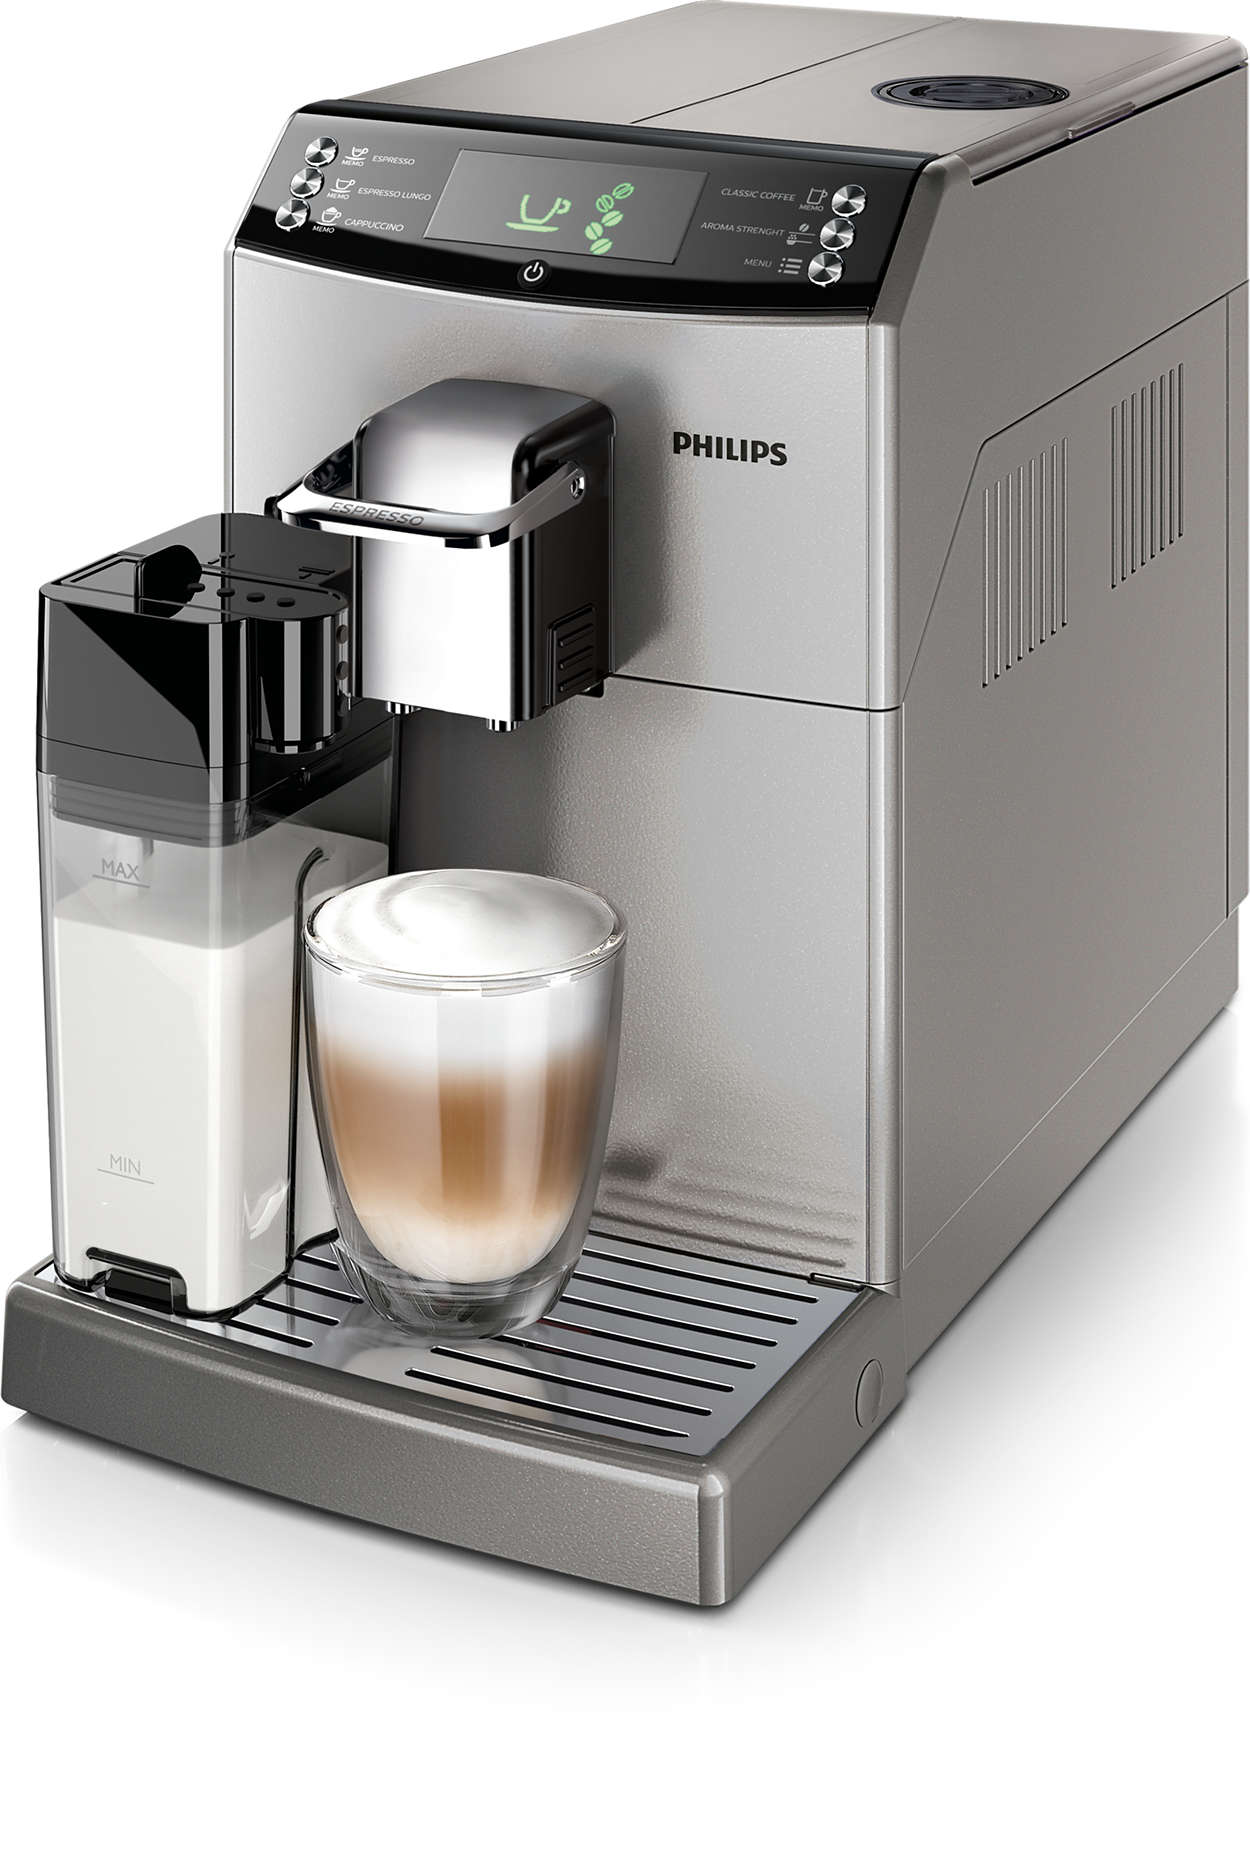 4000 series kaffeevollautomat hd8847 11 philips. Black Bedroom Furniture Sets. Home Design Ideas